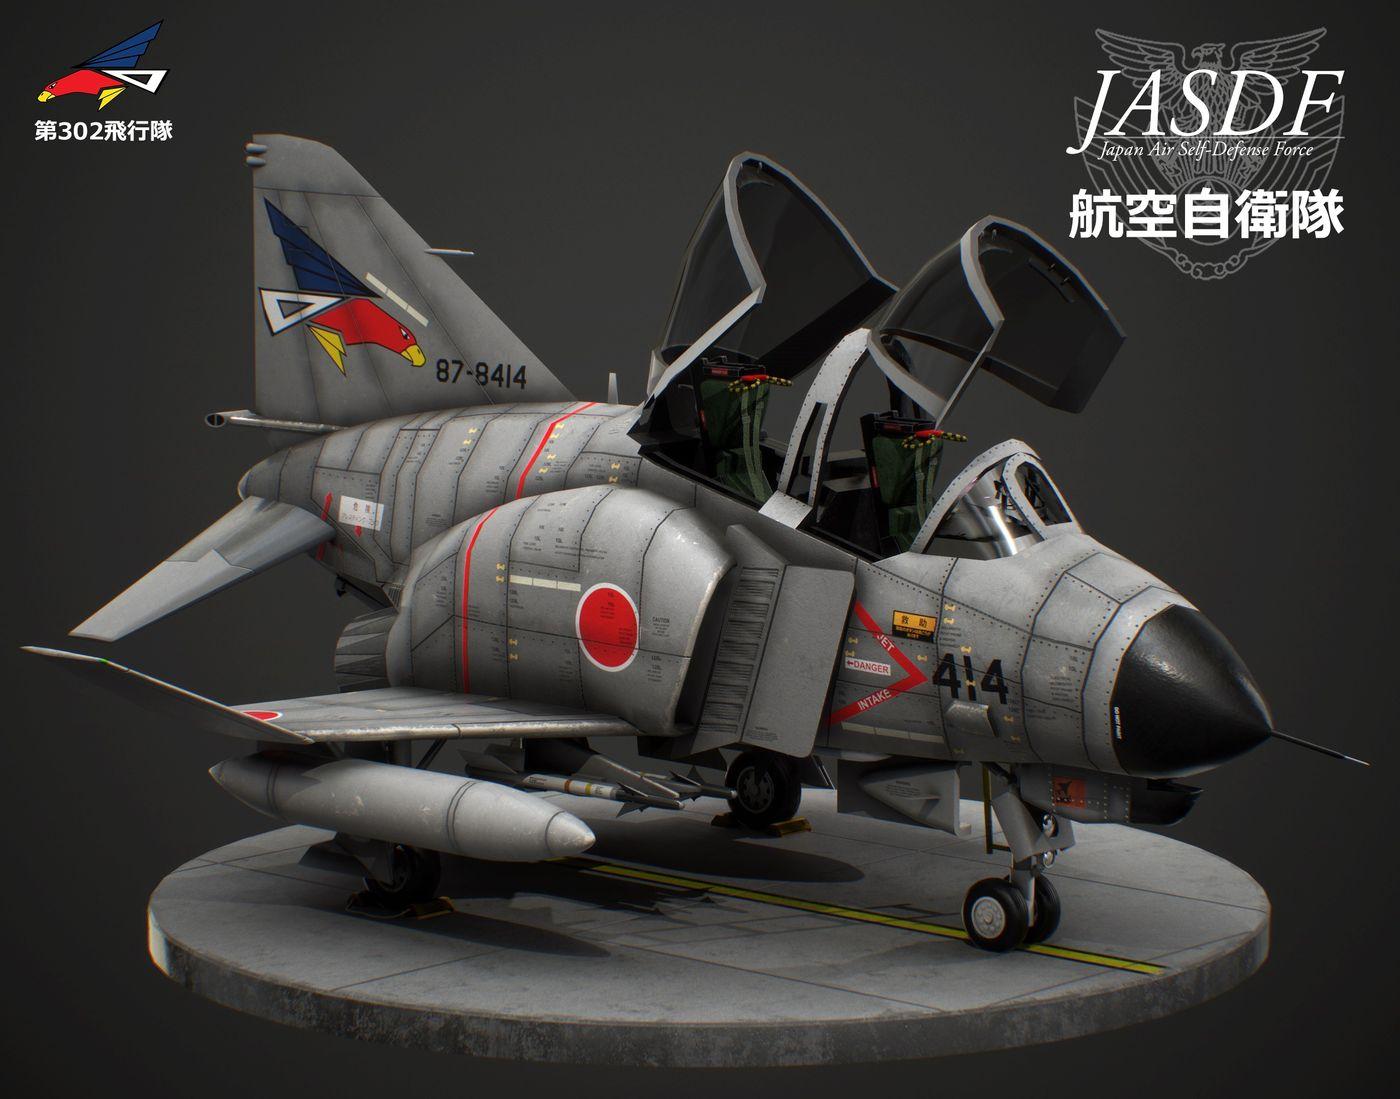 McDonnell Douglas (Mitsubishi) F-4EJ Phantom II 302nd Tactical Fighter Squadron (JASDF)